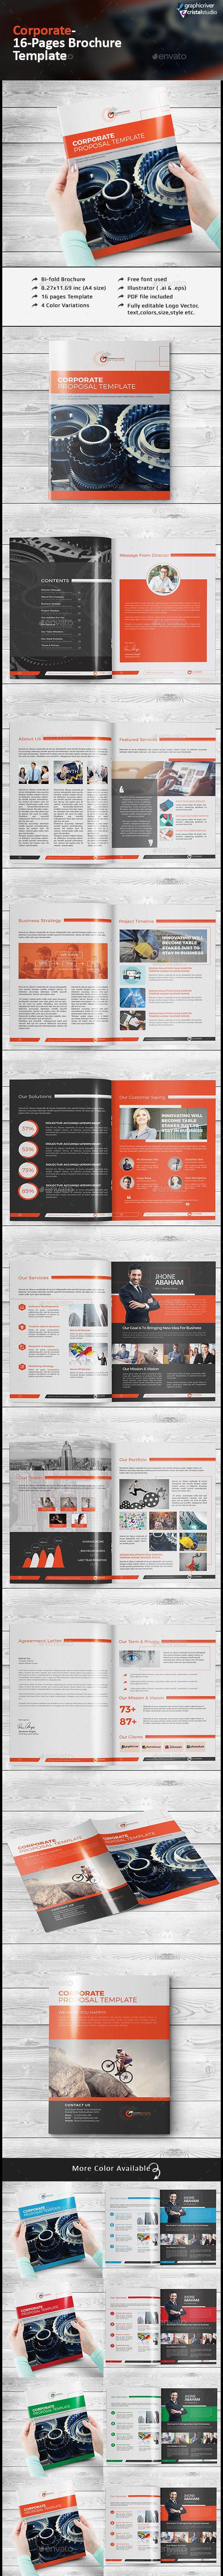 Corporate Business Brochure Template #design Download: http://graphicriver.net/item/corporate-business-brochure/12750911?ref=ksioks